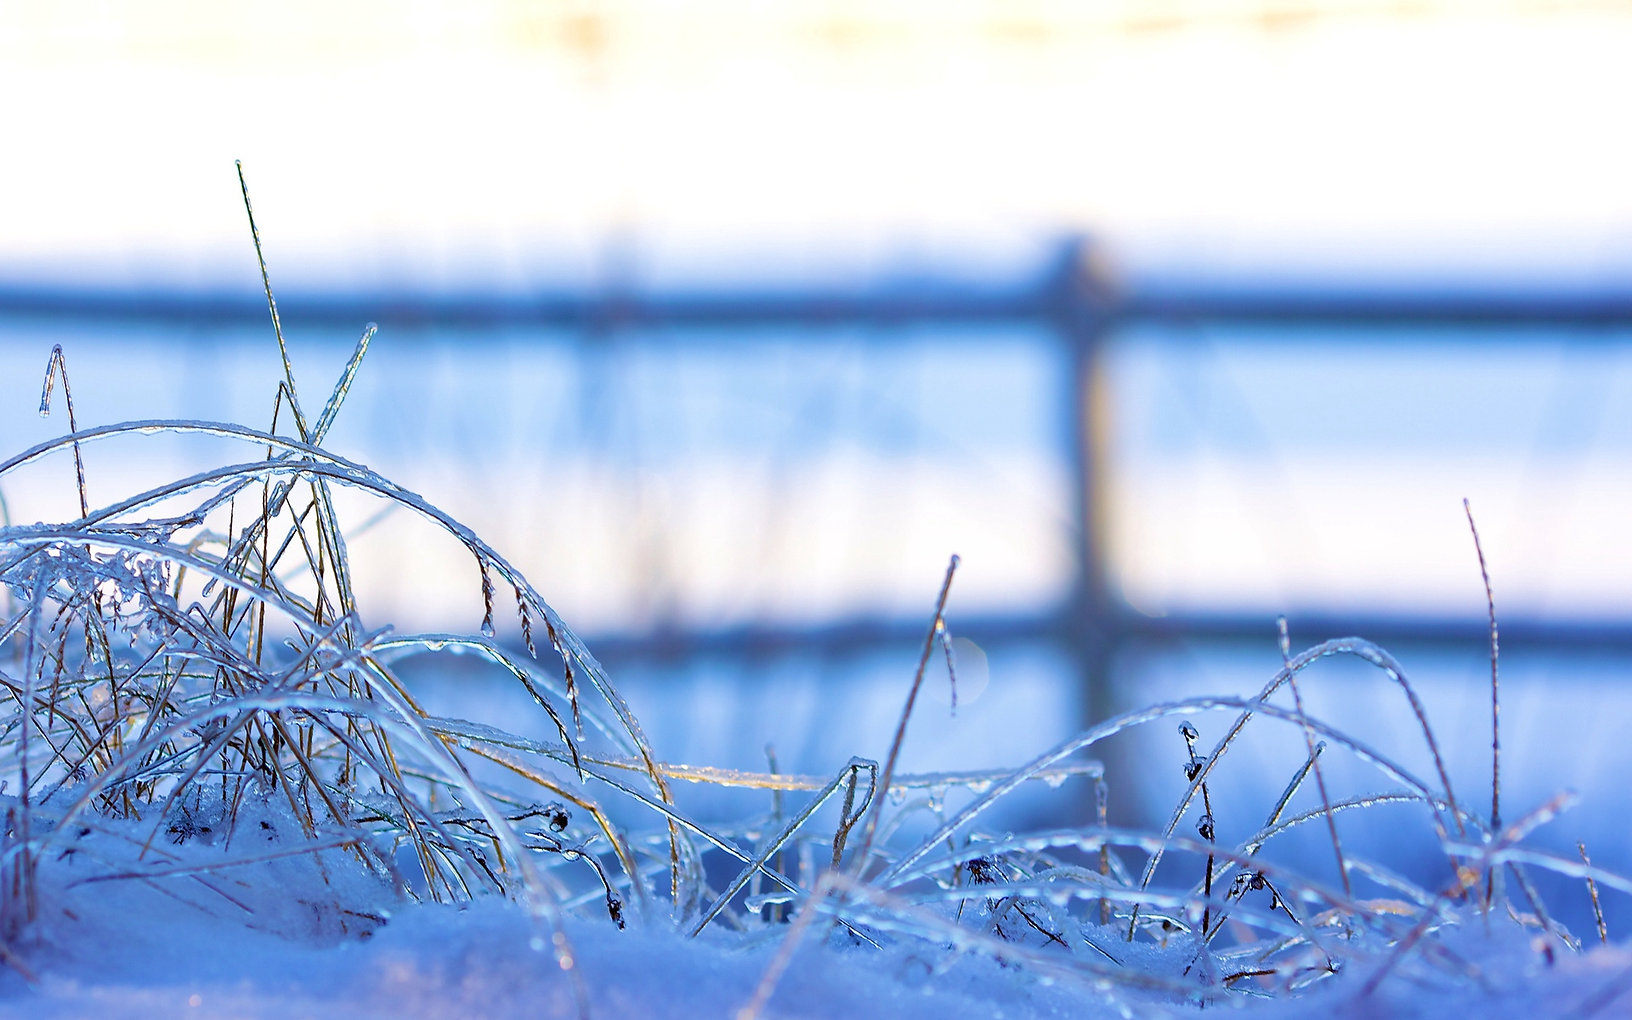 snow_frozen_grass_ice_winter_80994_1920x